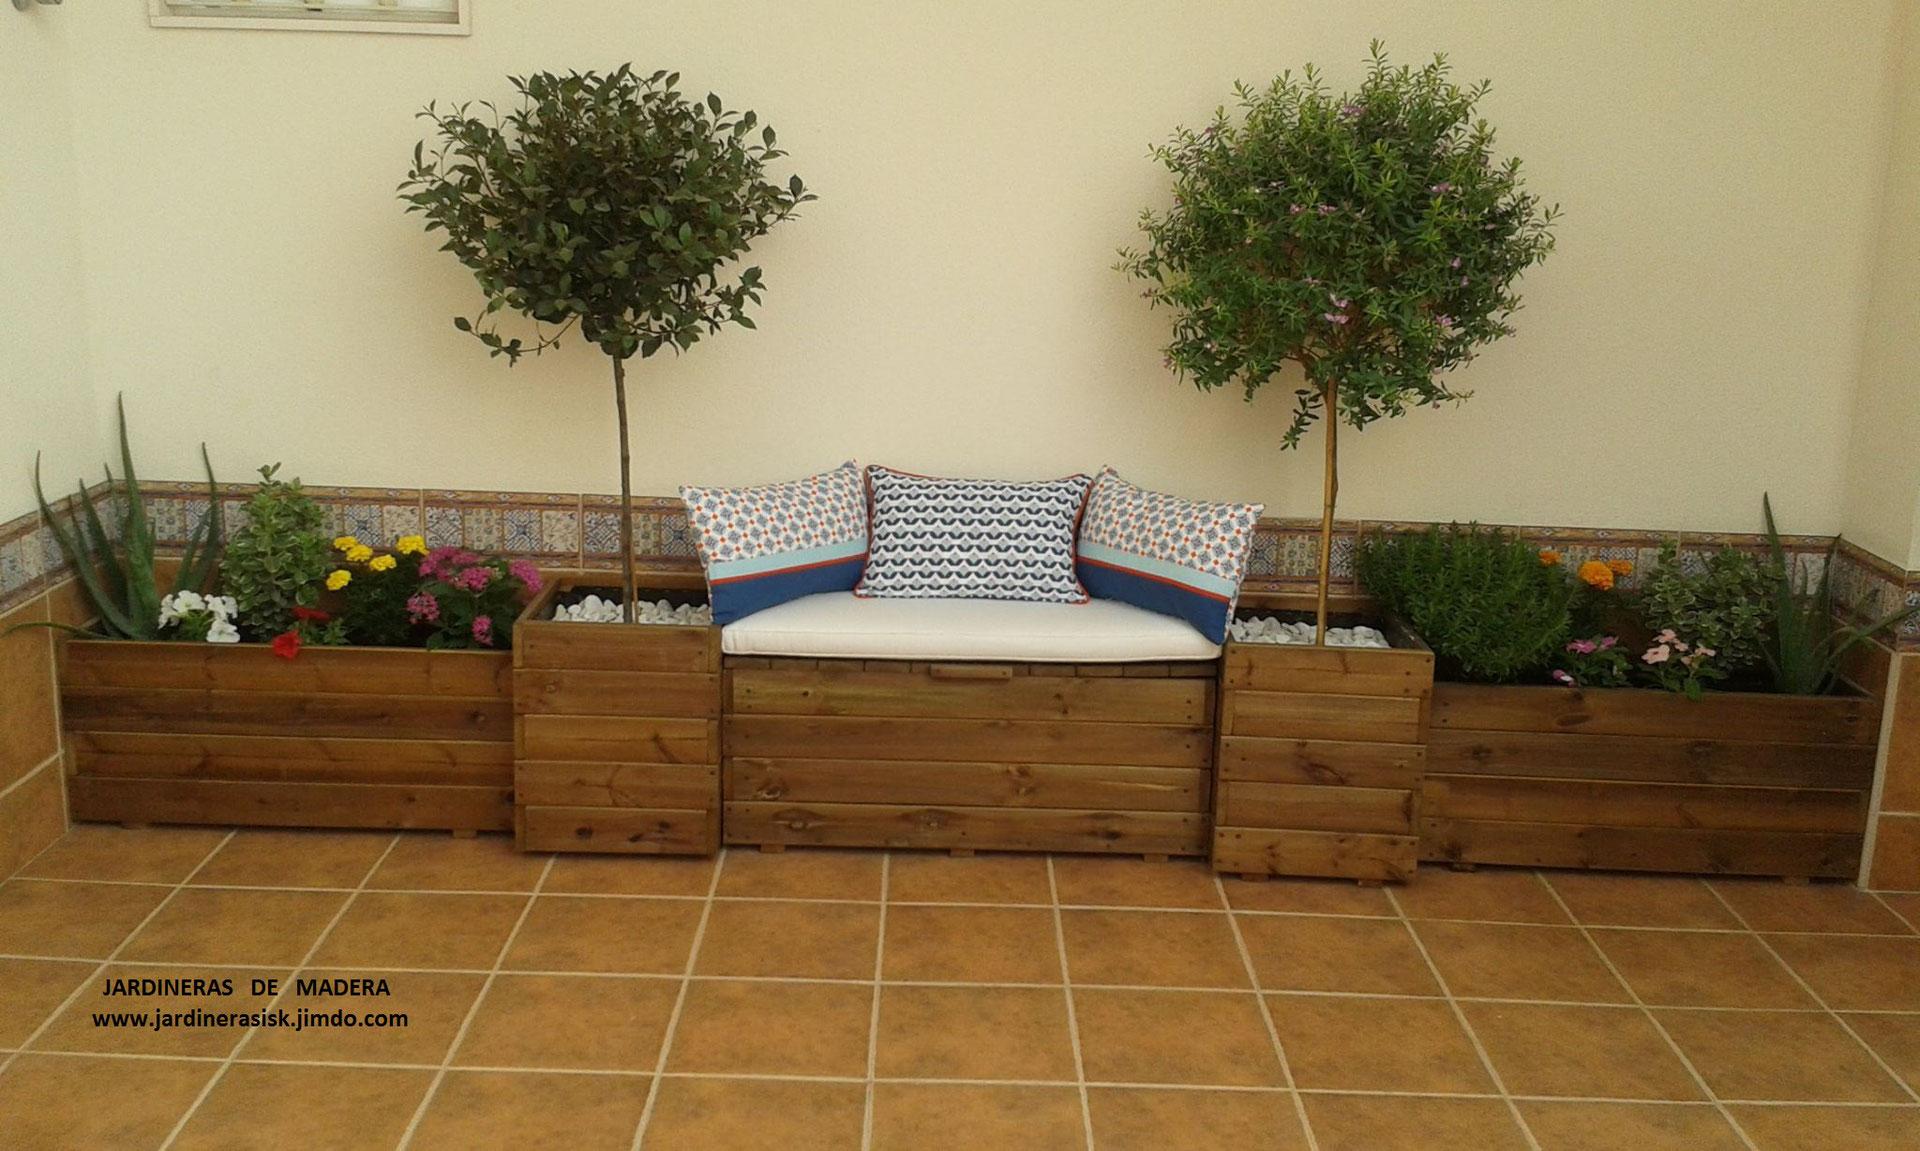 Jardineras de madera celosias baules huertos urbanos - Jardineras de madera caseras ...